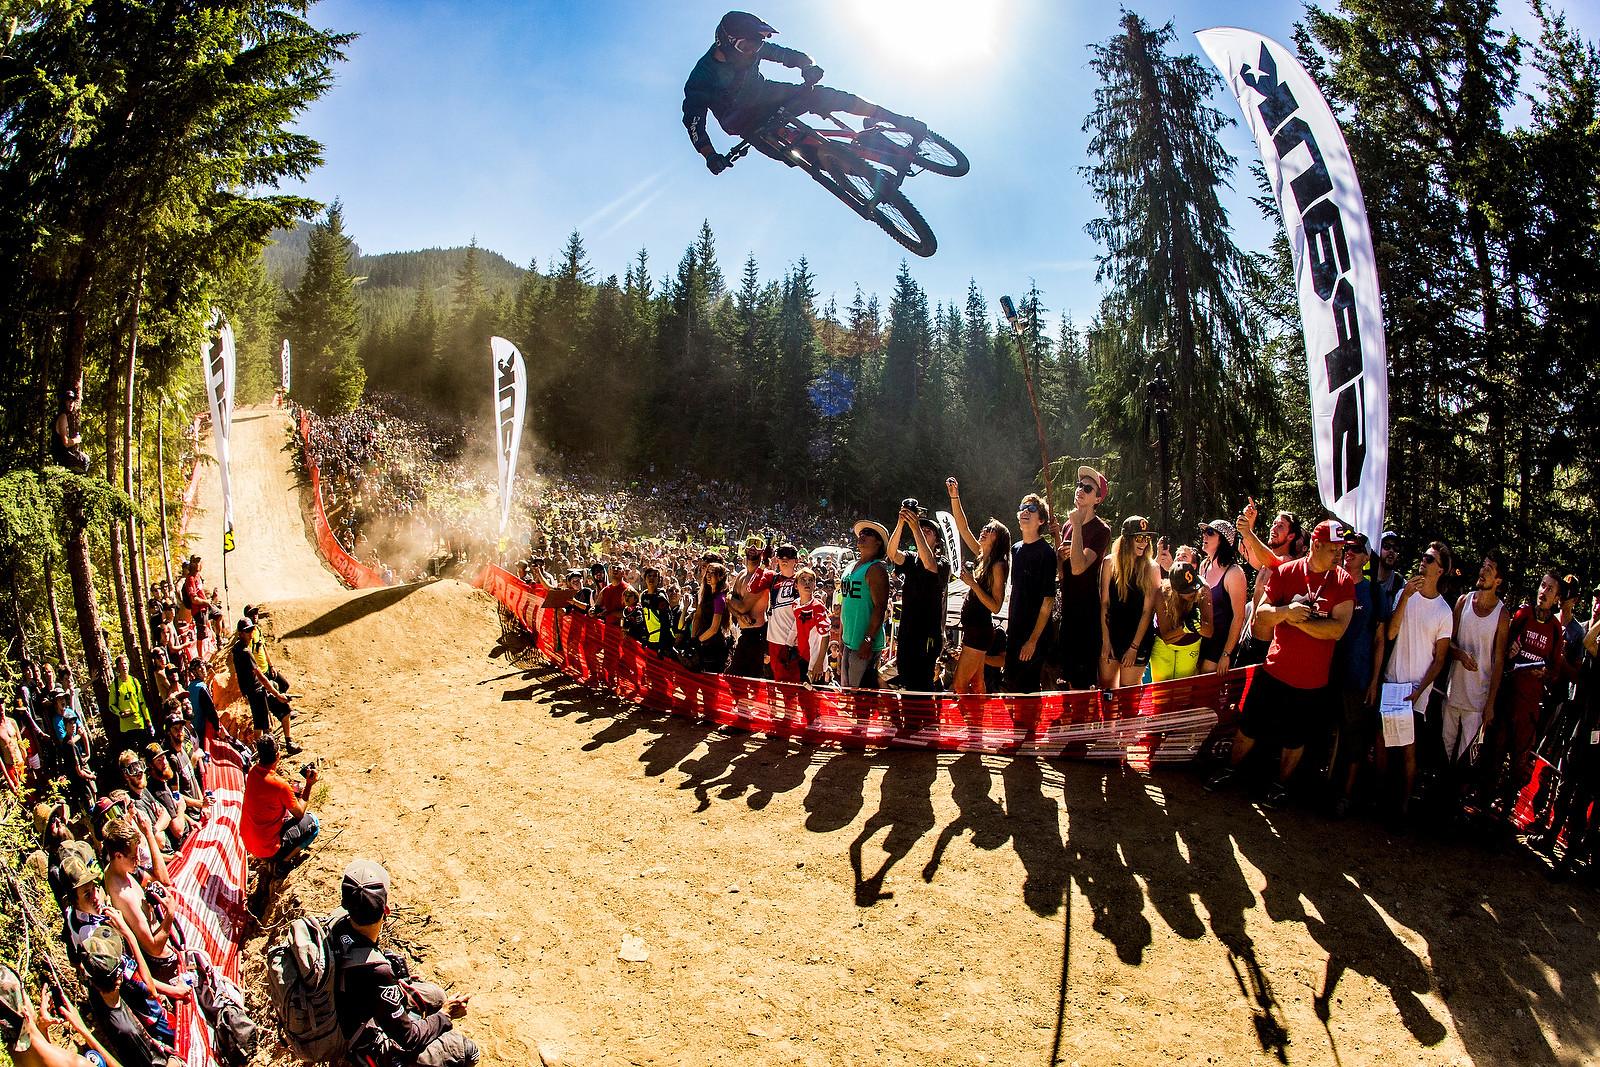 Vanderham Verisimilitude - Whip Off World Champs Photo Blast - Mountain Biking Pictures - Vital MTB